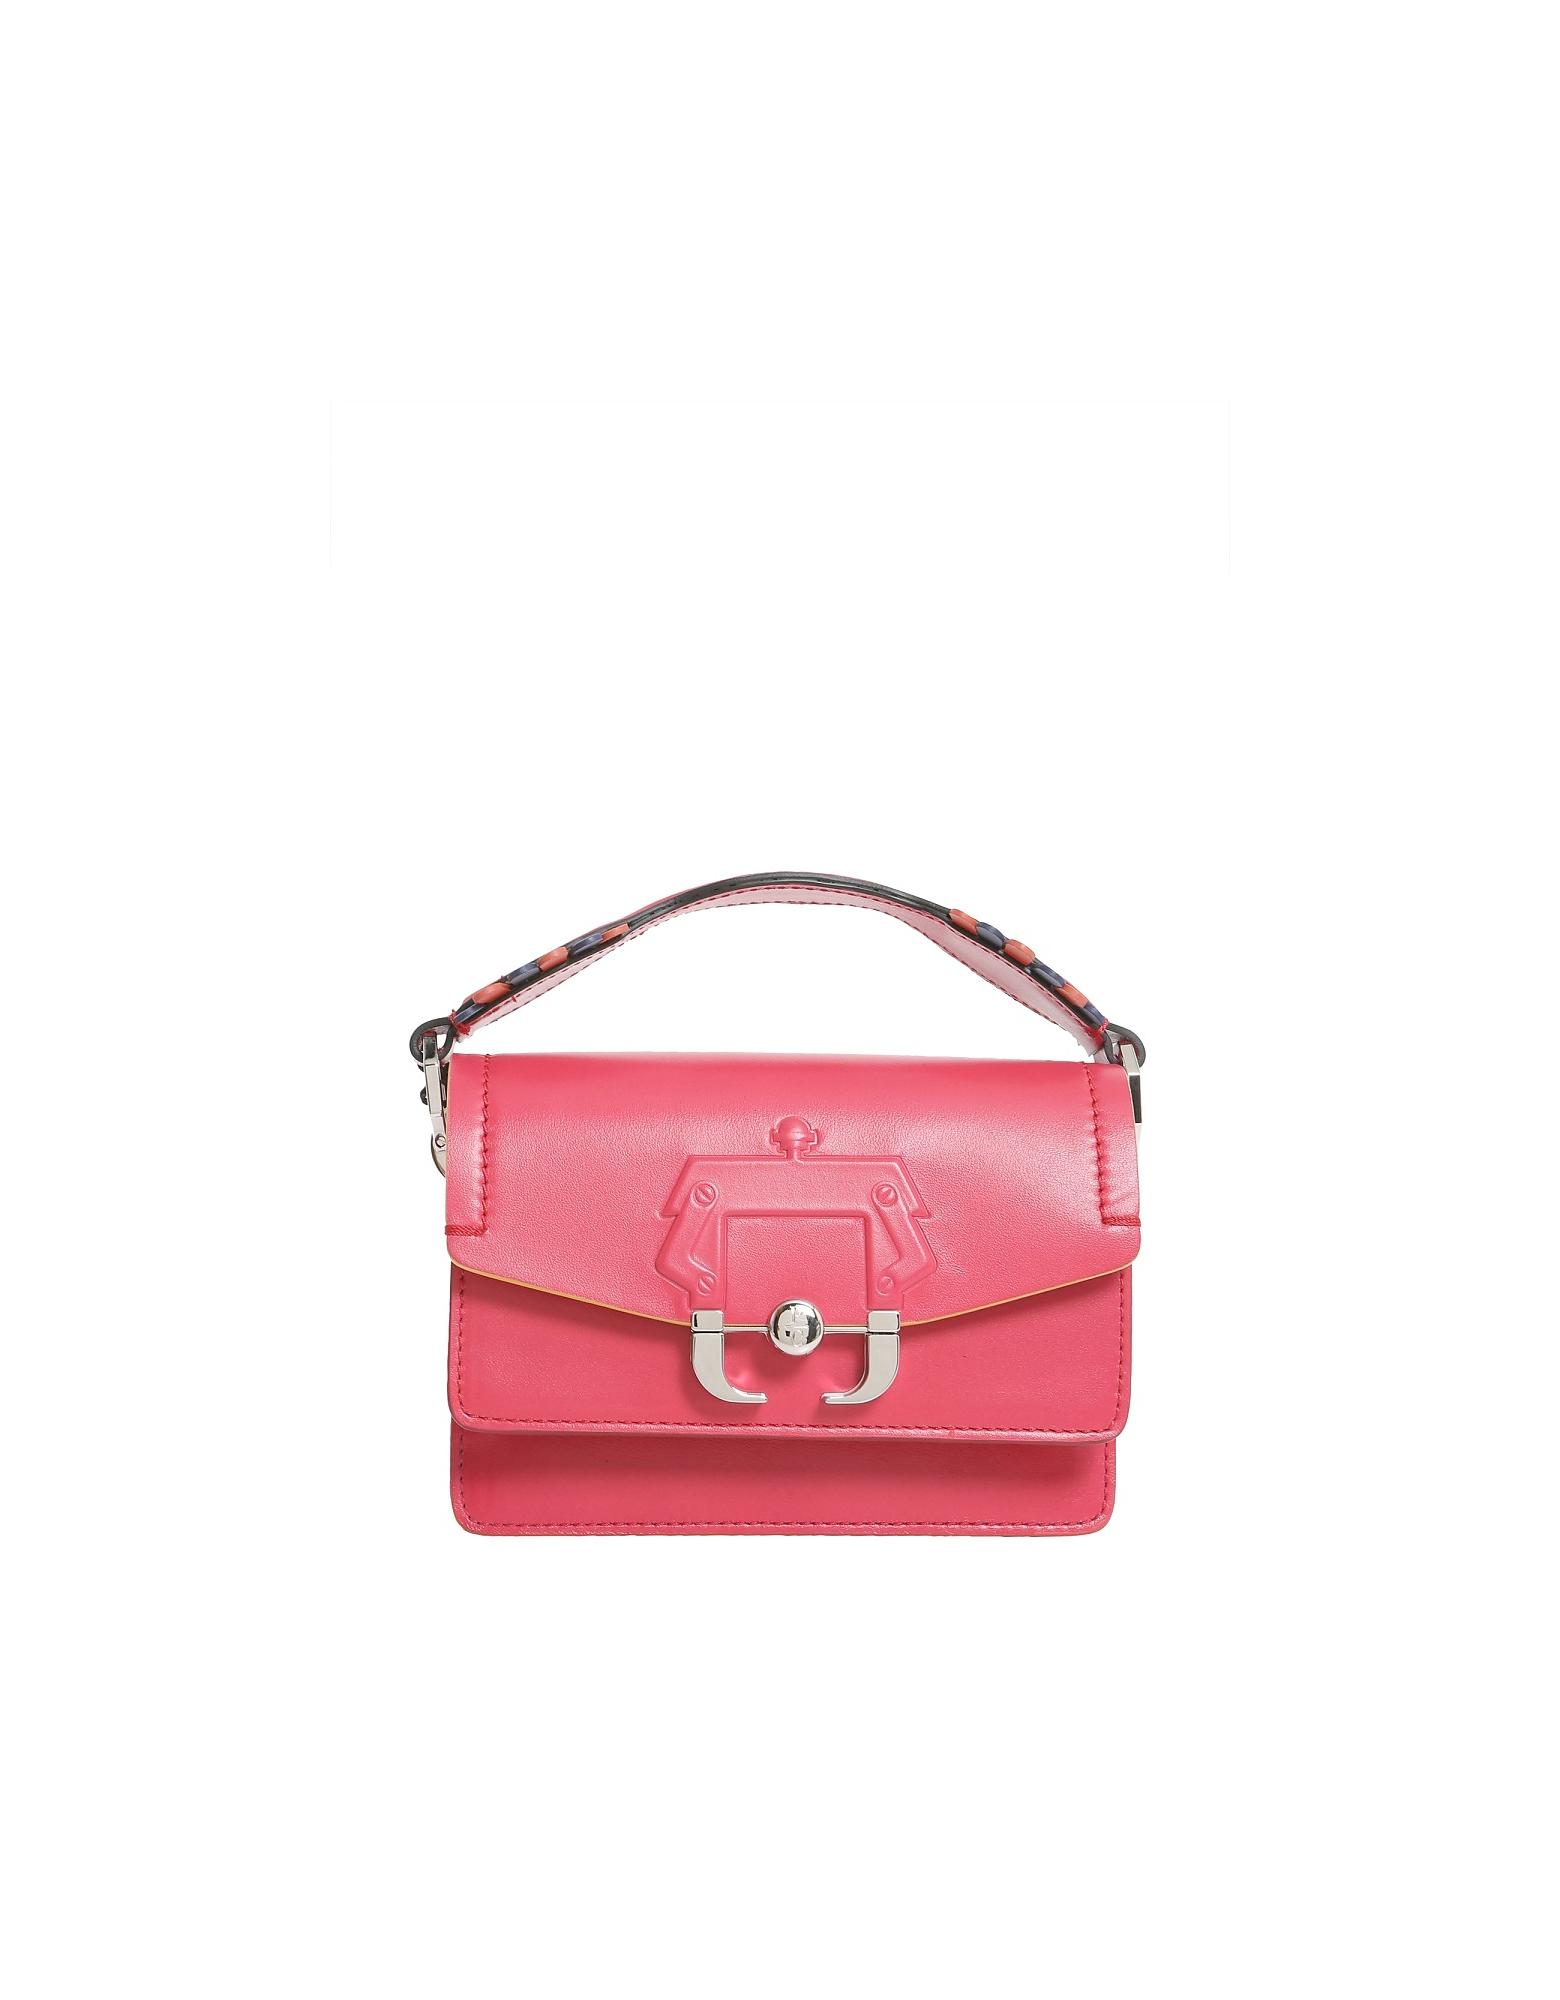 Paula Cademartori Designer Handbags, Mini Twi Twi Bag